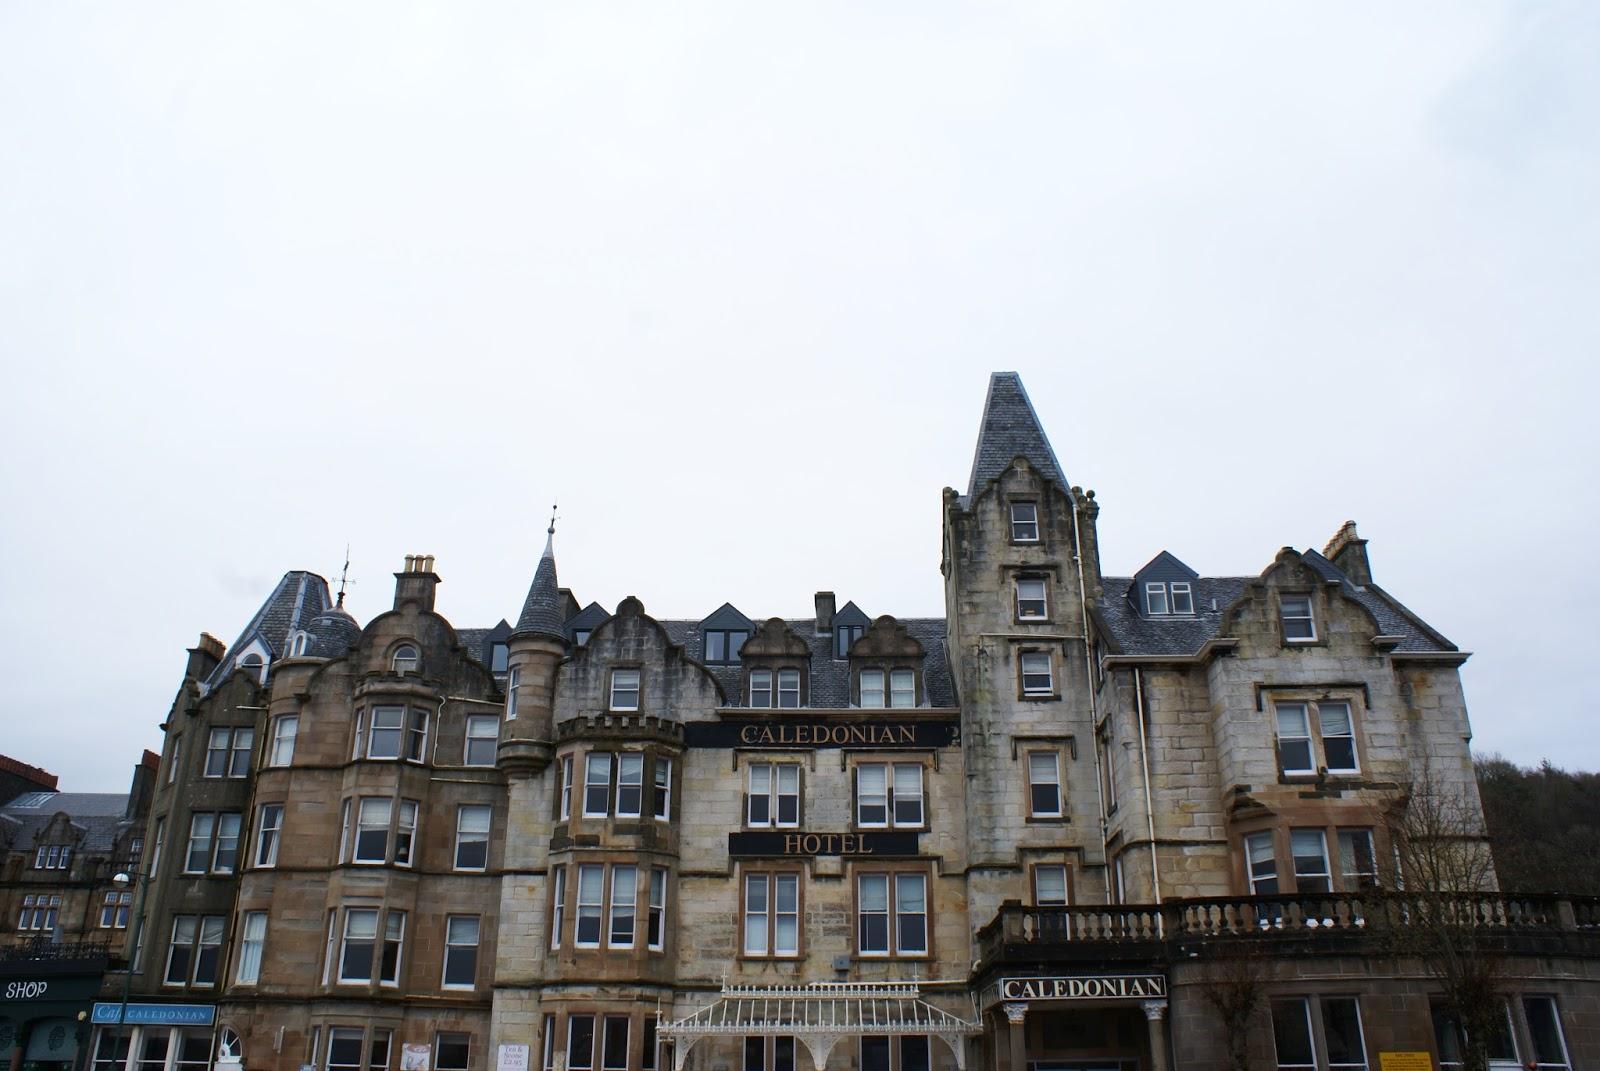 caledonian hotel oban argyll highlands scotland uk great britain camomille blend